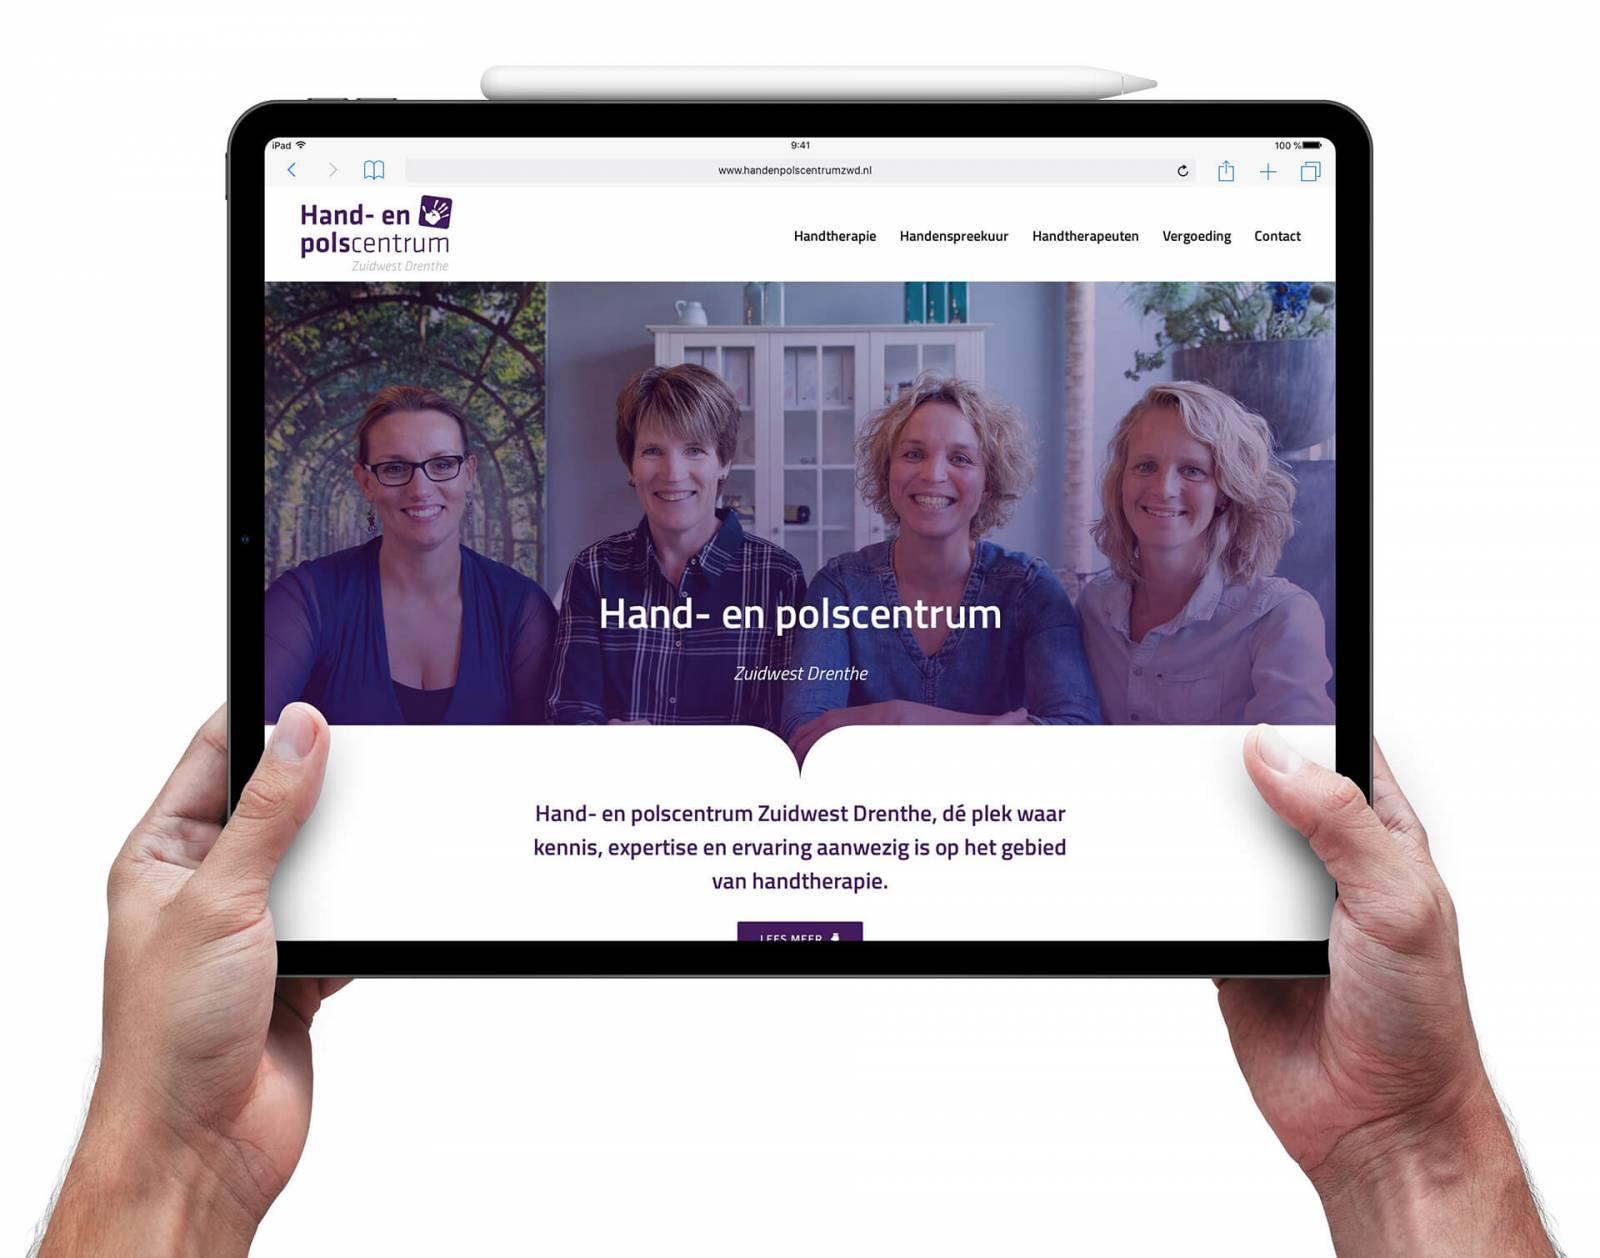 Hand- en polscentrum Zuidwest Drenthe